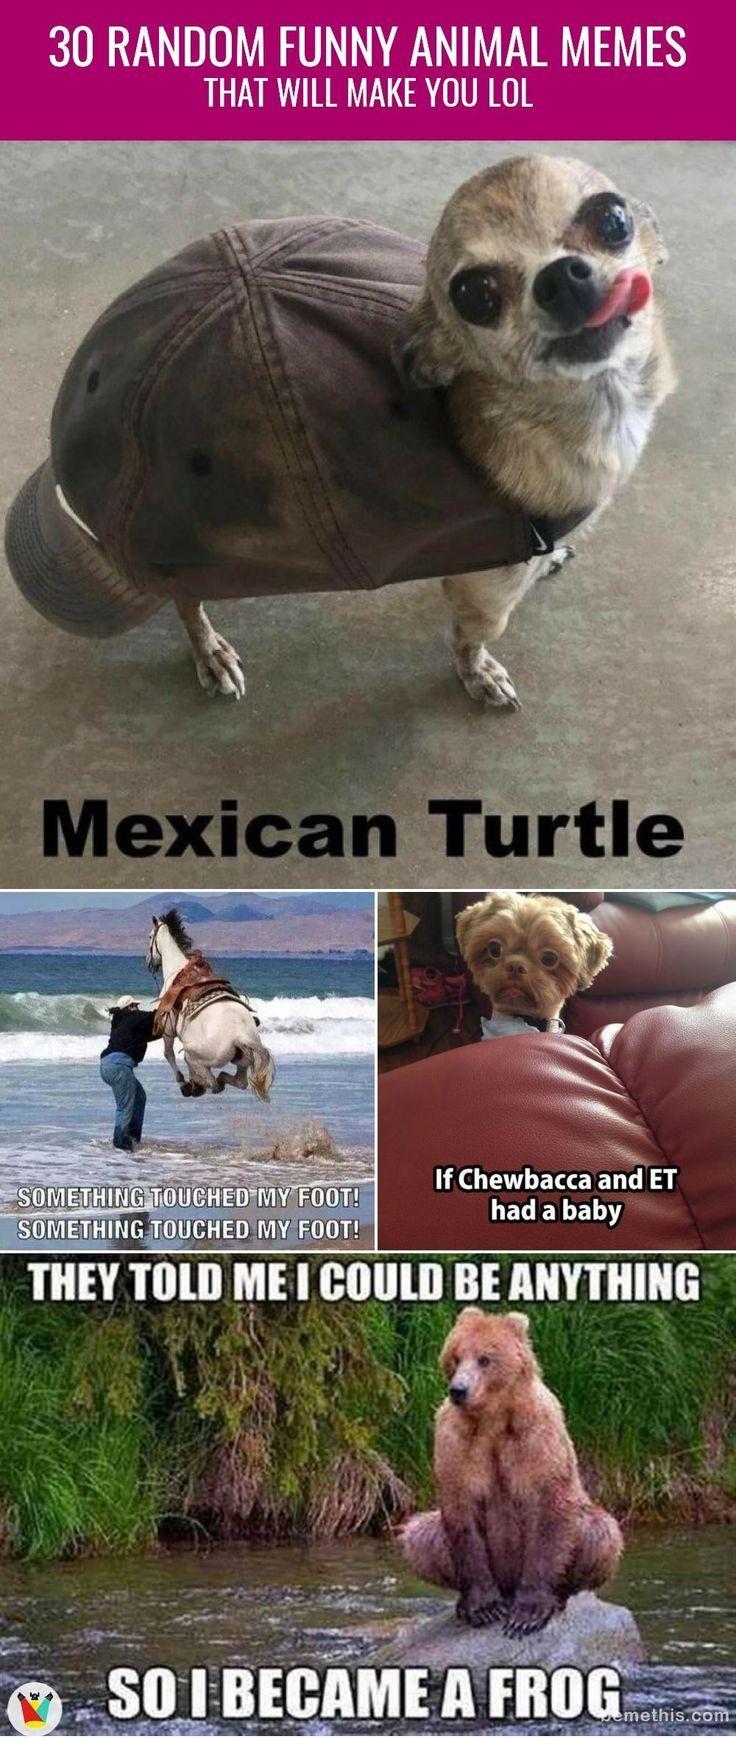 30 Random Funny Animal Memes That Will Make You Lol Are You Having A Sulky Day Funny Animal Memes Animal Memes Funny Animals